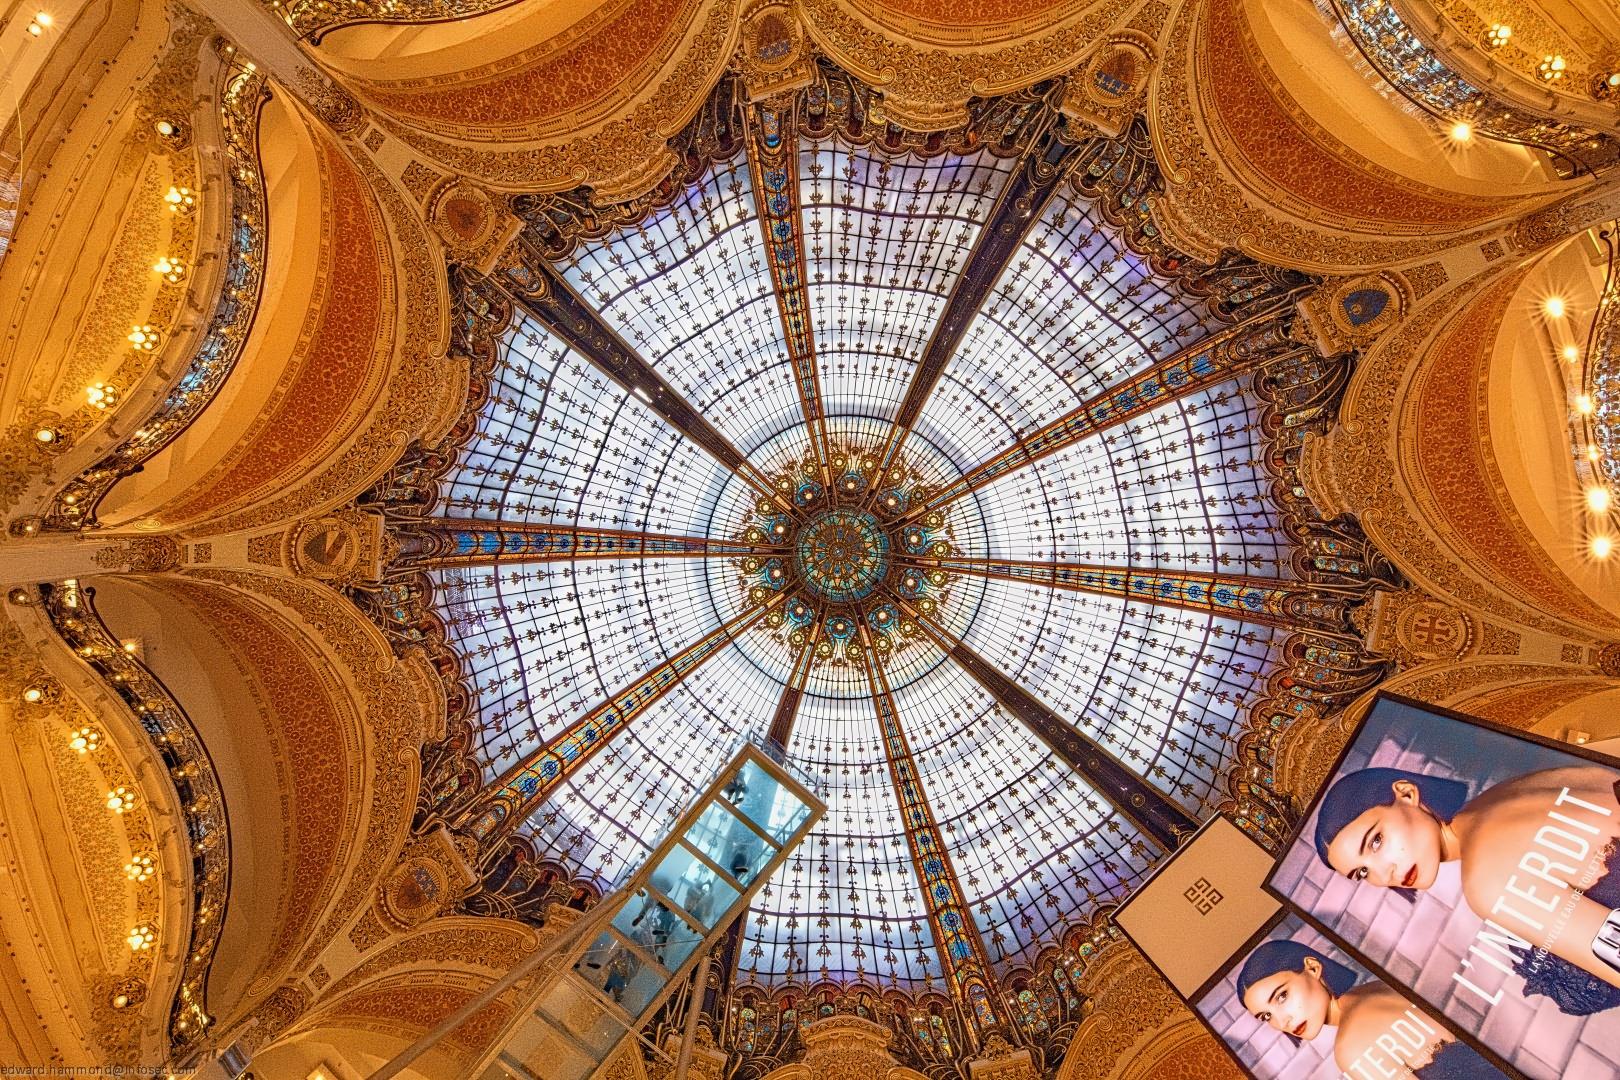 Galeries Lafayette, France